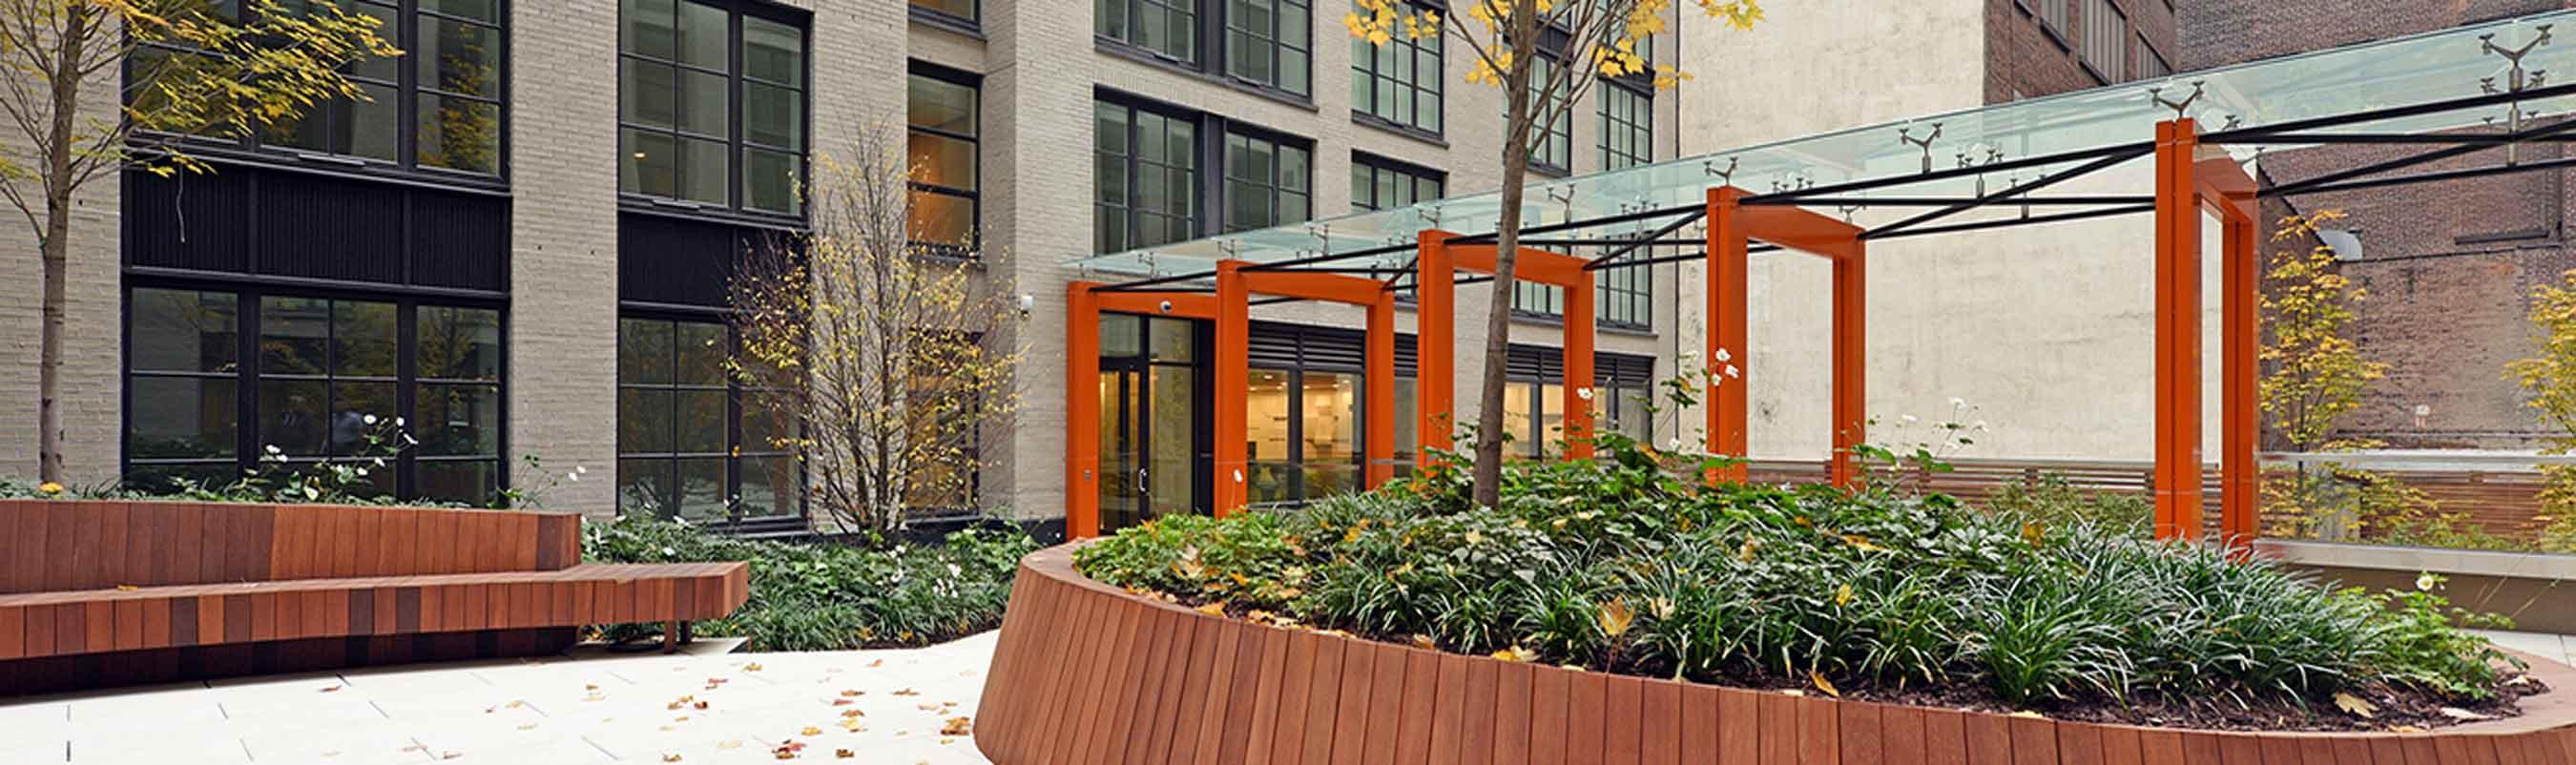 Nature Center As Amenity For Housing Development